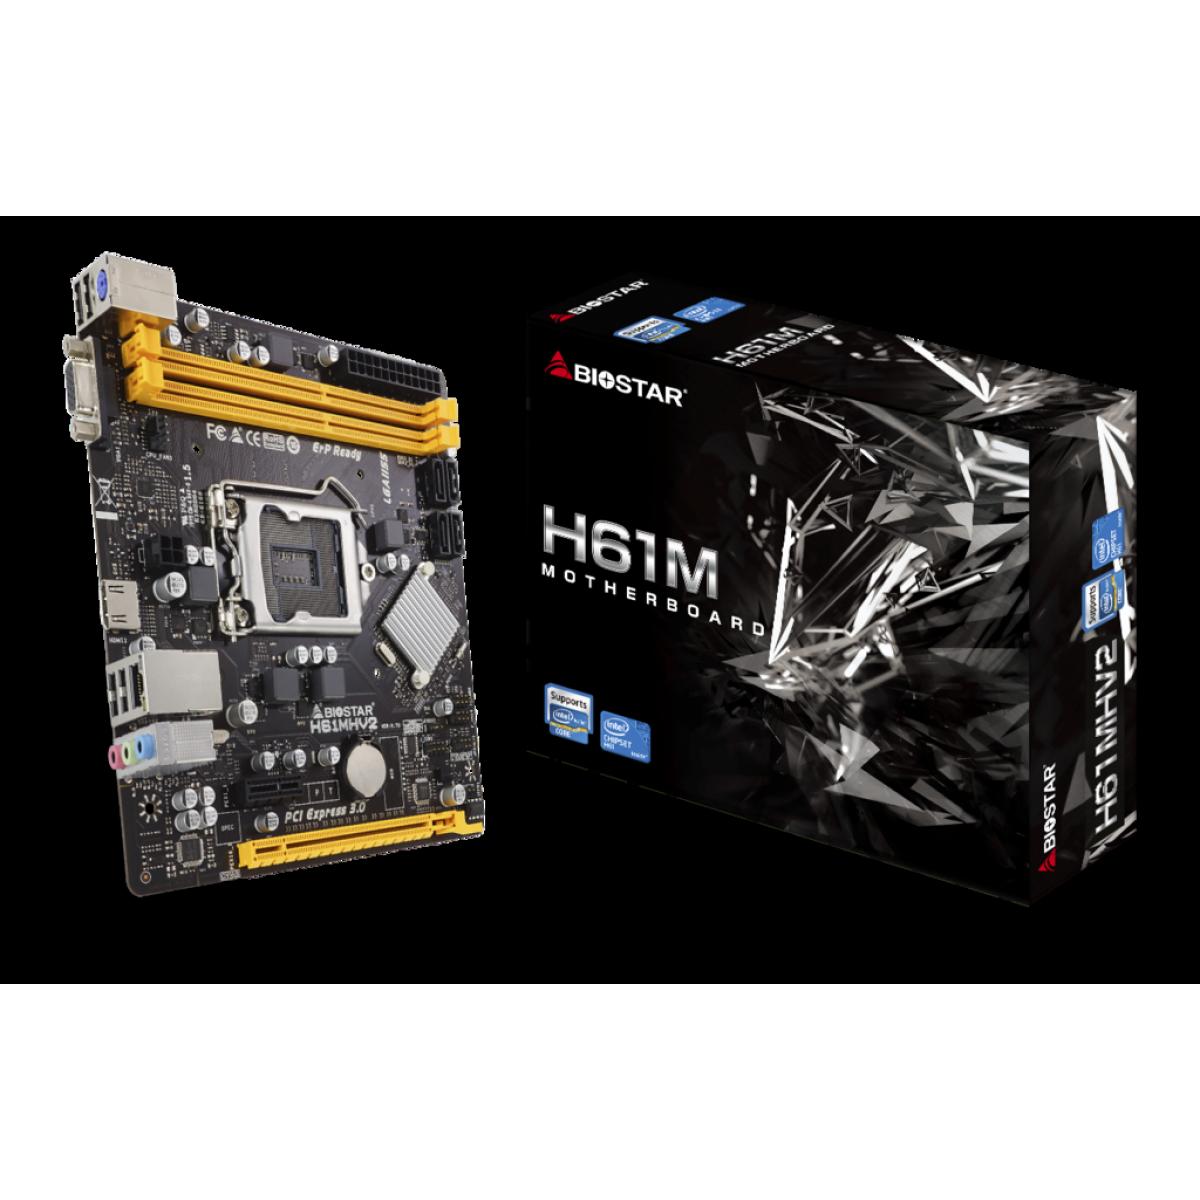 Placa Mãe Biostar H61MHV2 Ver. 7.0, Chipset H61, LGA 1155, mATX, DDR3